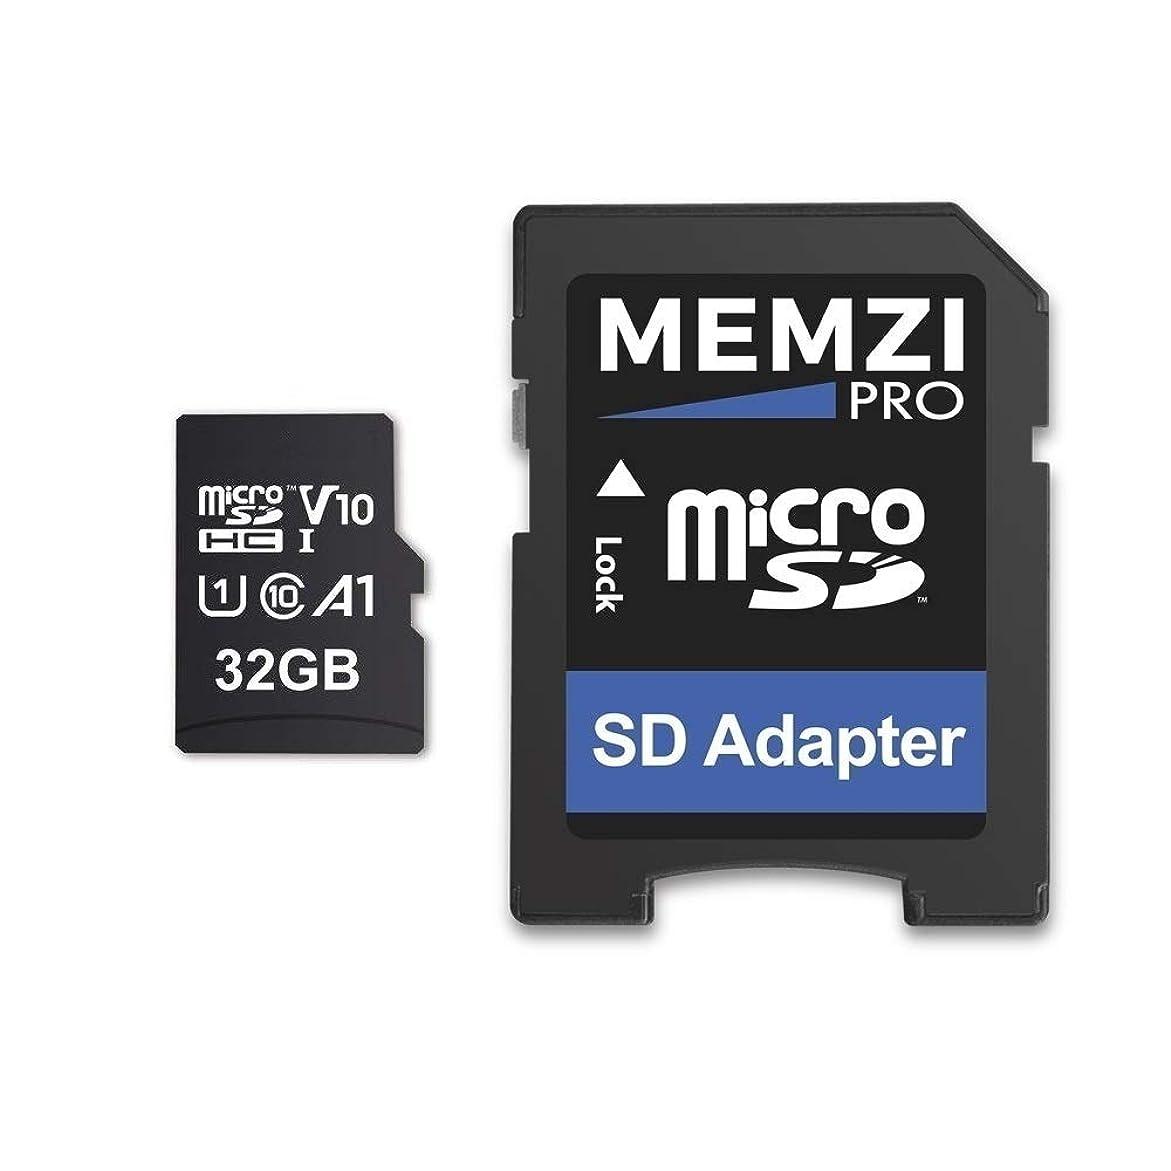 継続中ジュニア狂信者MEMZI PRO 32GB 100MB/s Class 10 A1 V10 Micro SDHCメモリーカード SDアダプター付き LG Q7a、Q6a、Q6 Prime、Q Stylus a、Q Stylus+、K11+、Stylus 3、Harmony 2、Zone 4携帯電話用